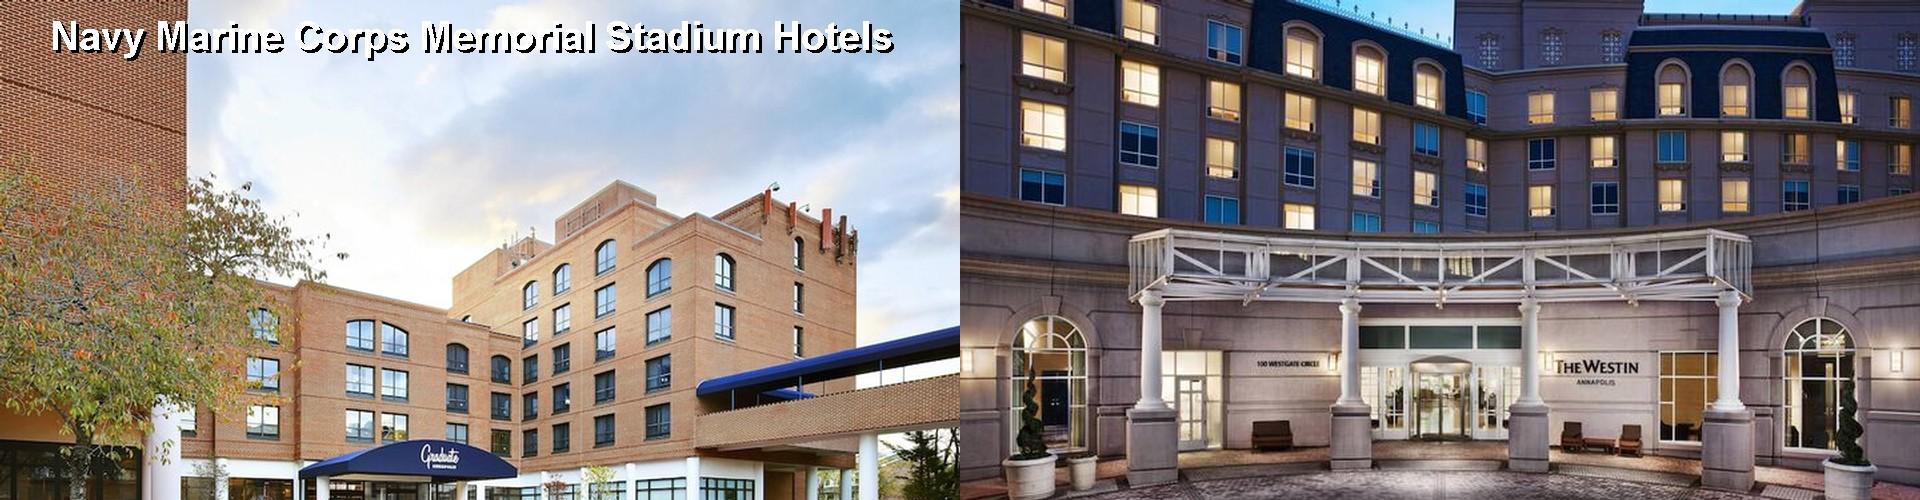 Good Best Hotels Near Navy Marine Corps Memorial Stadium With Fedex Field